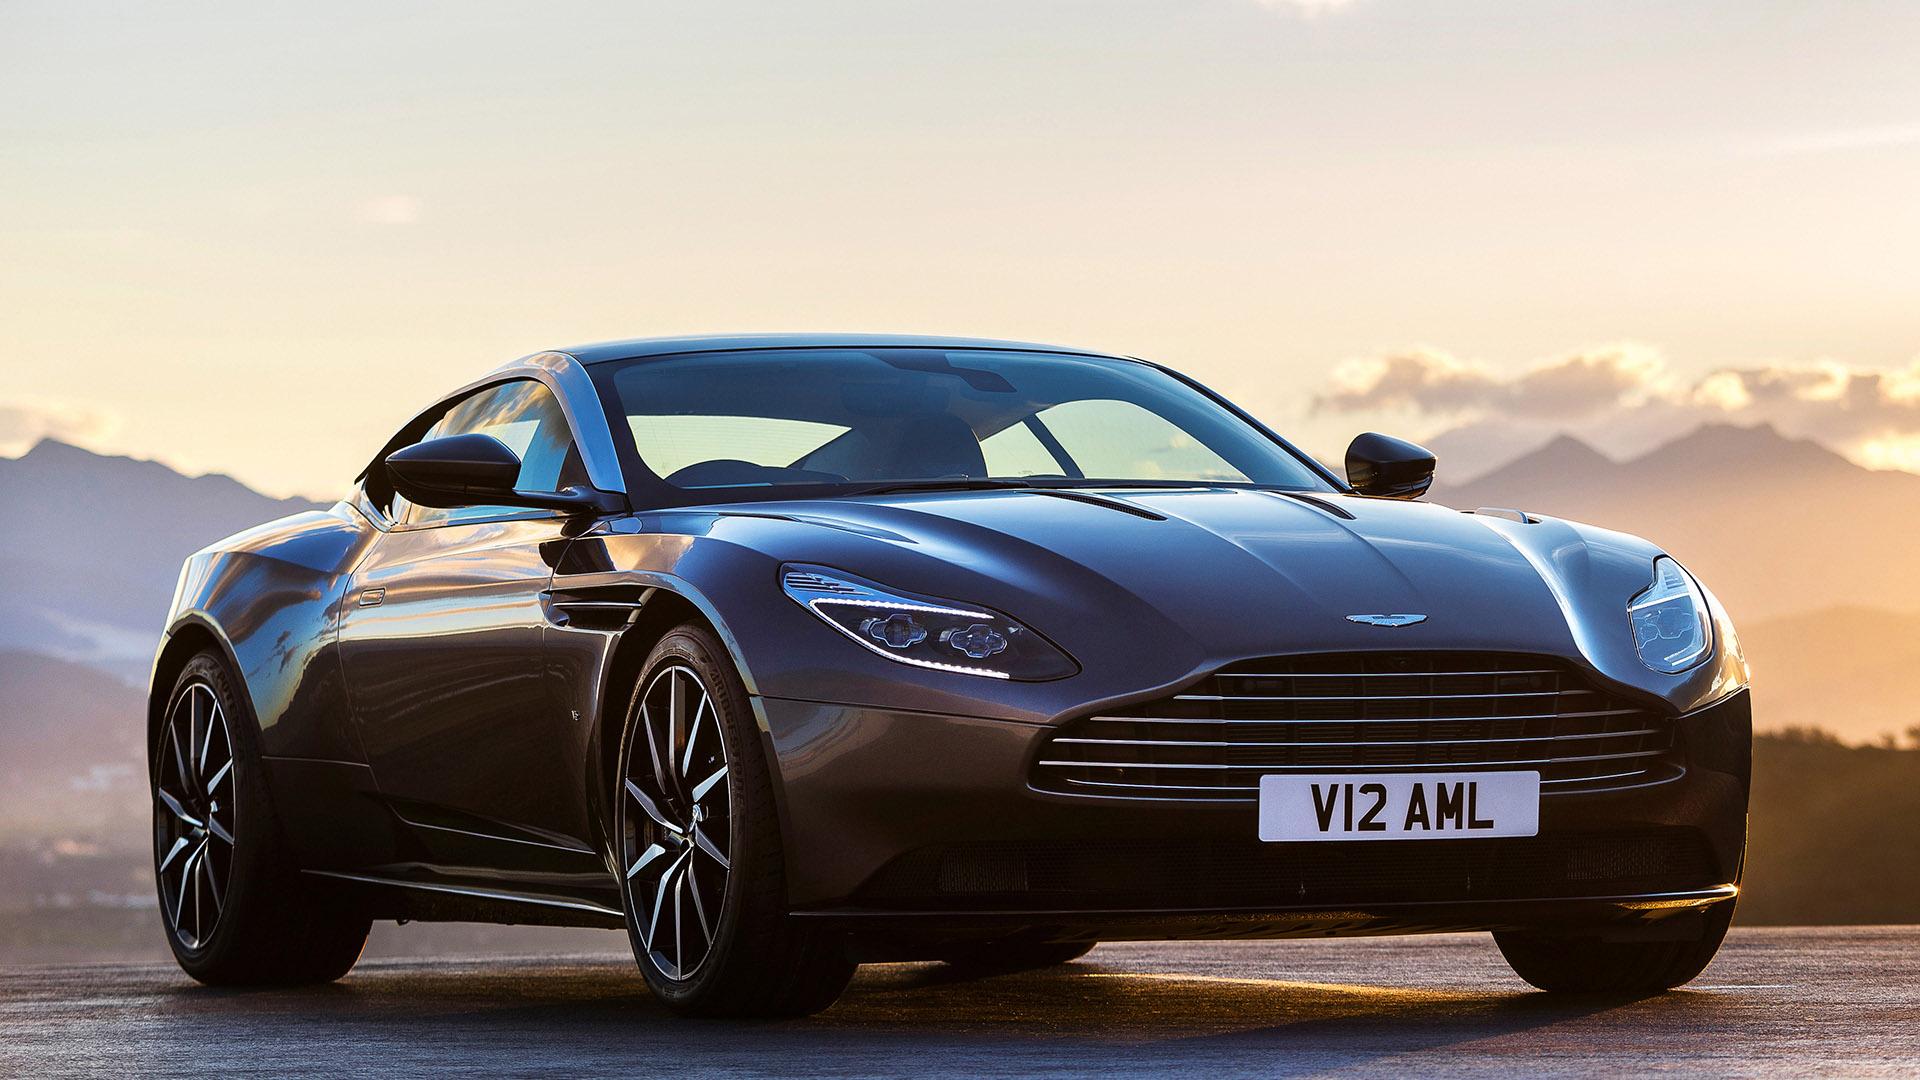 2018 Aston Martin Db11 For Sale Near Killeen Tx Aston Martin Of